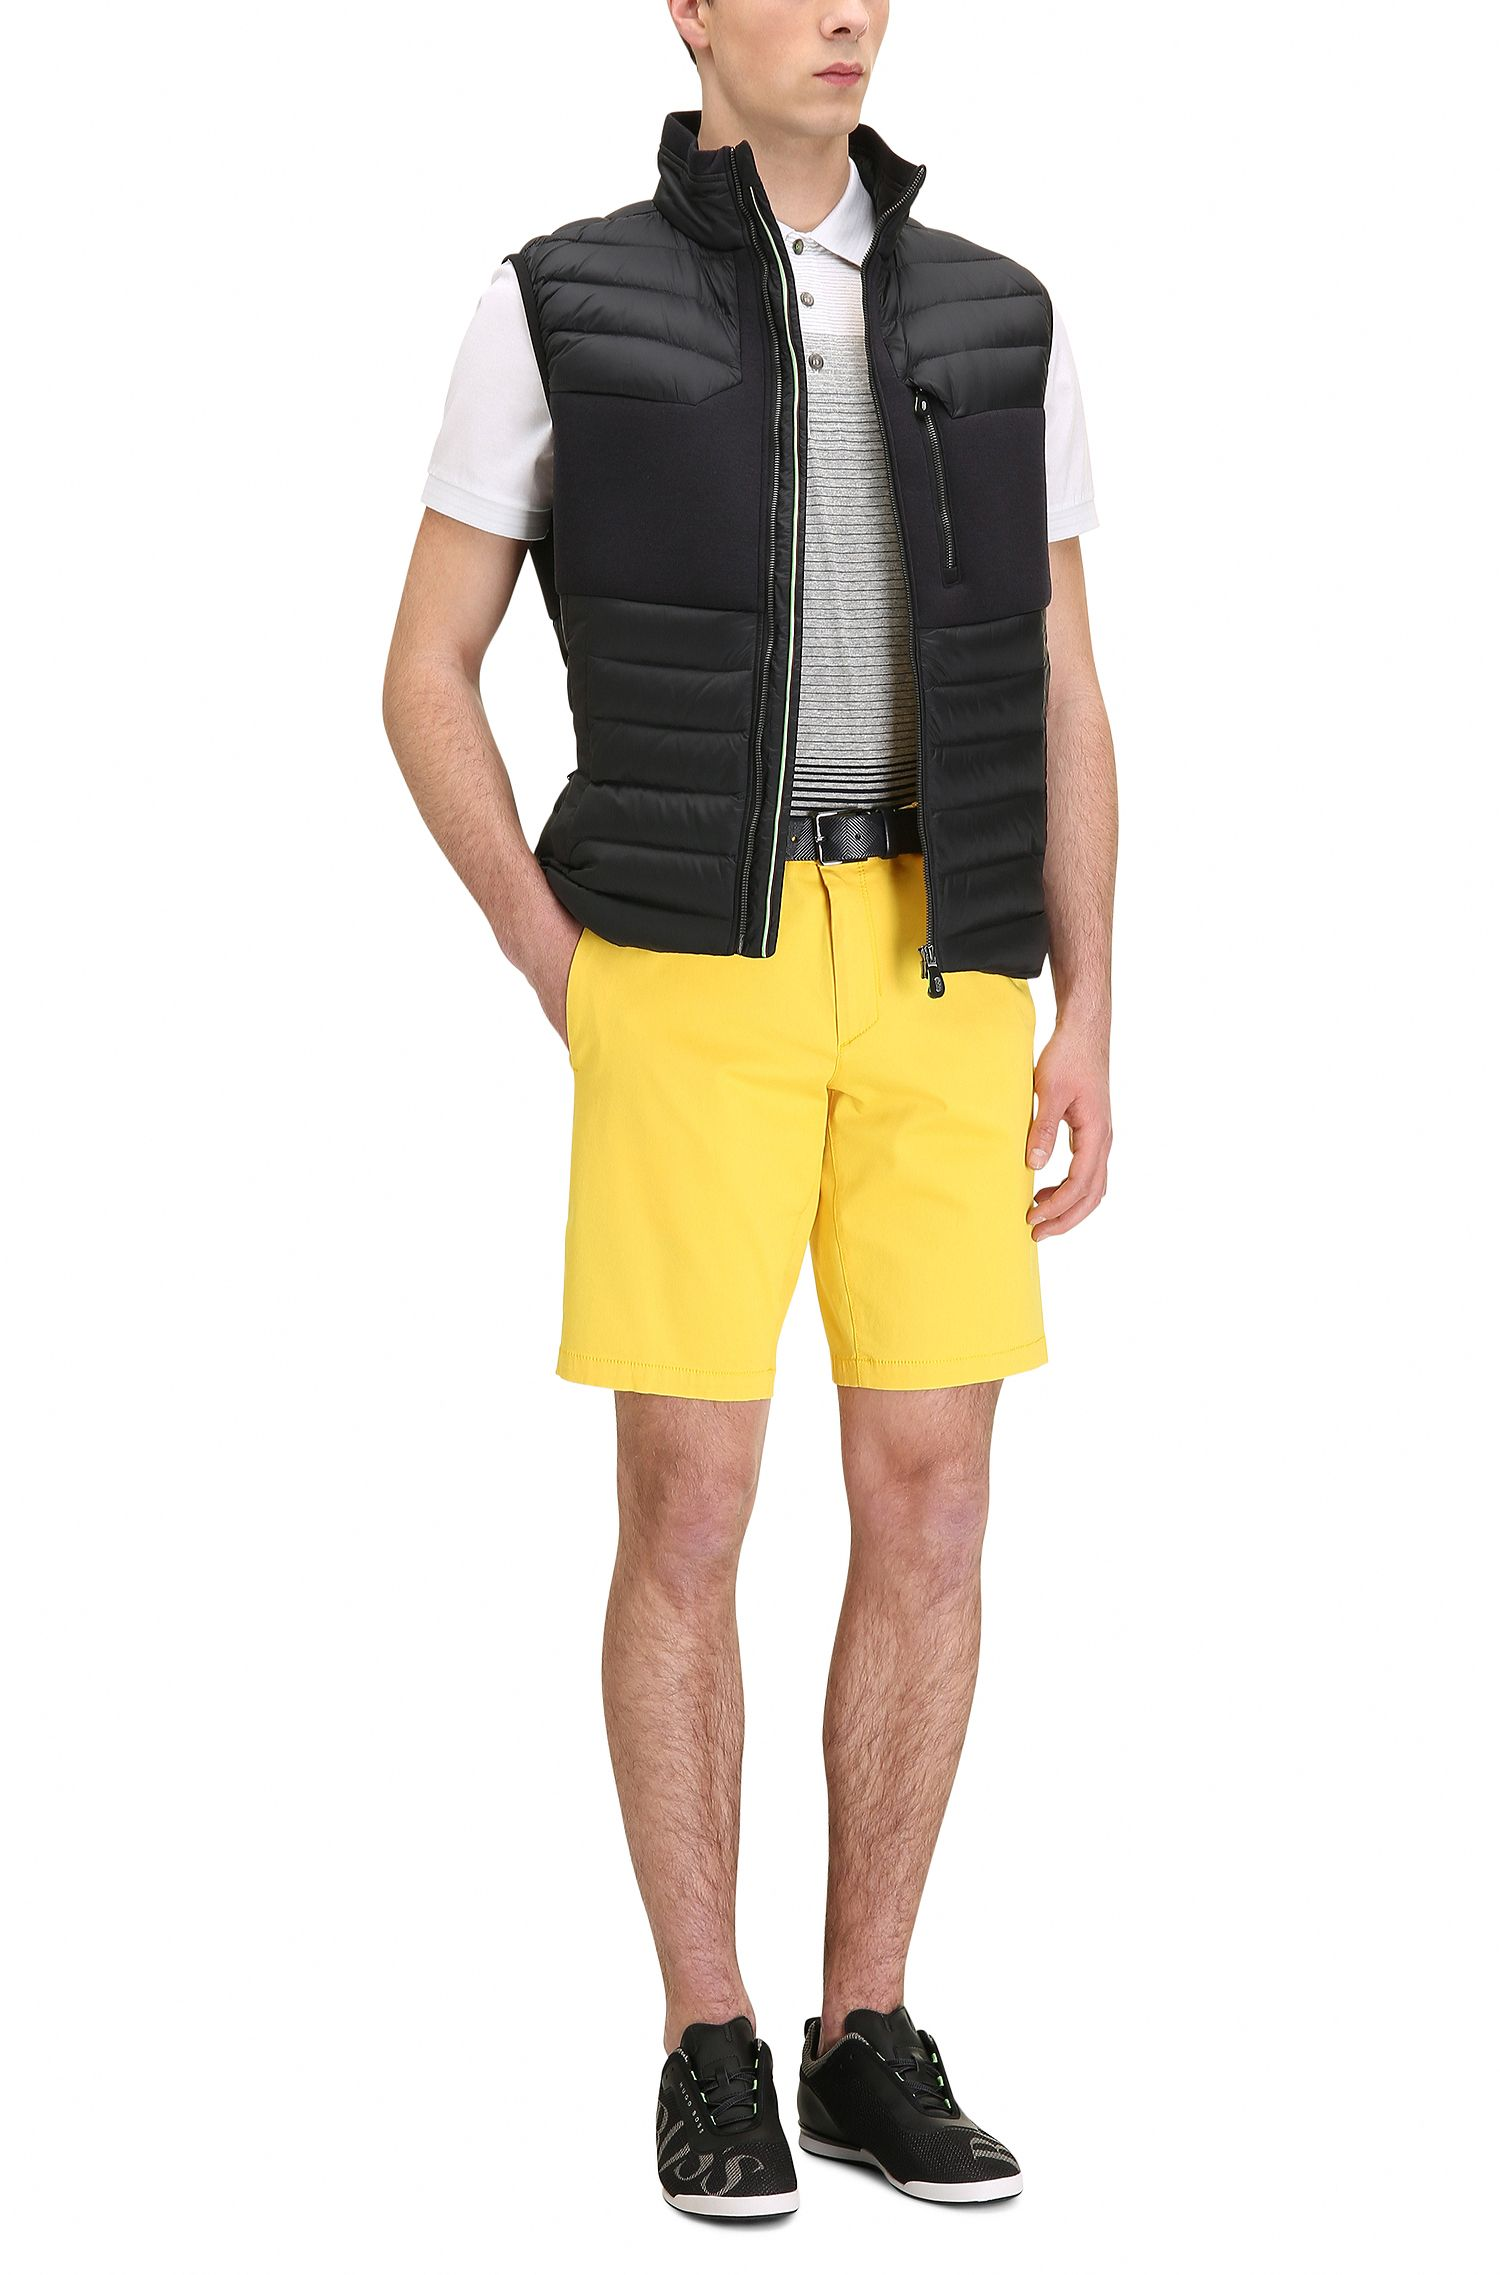 Satin Stretch Cotton Shorts, Slim Fit | Liem W, Yellow